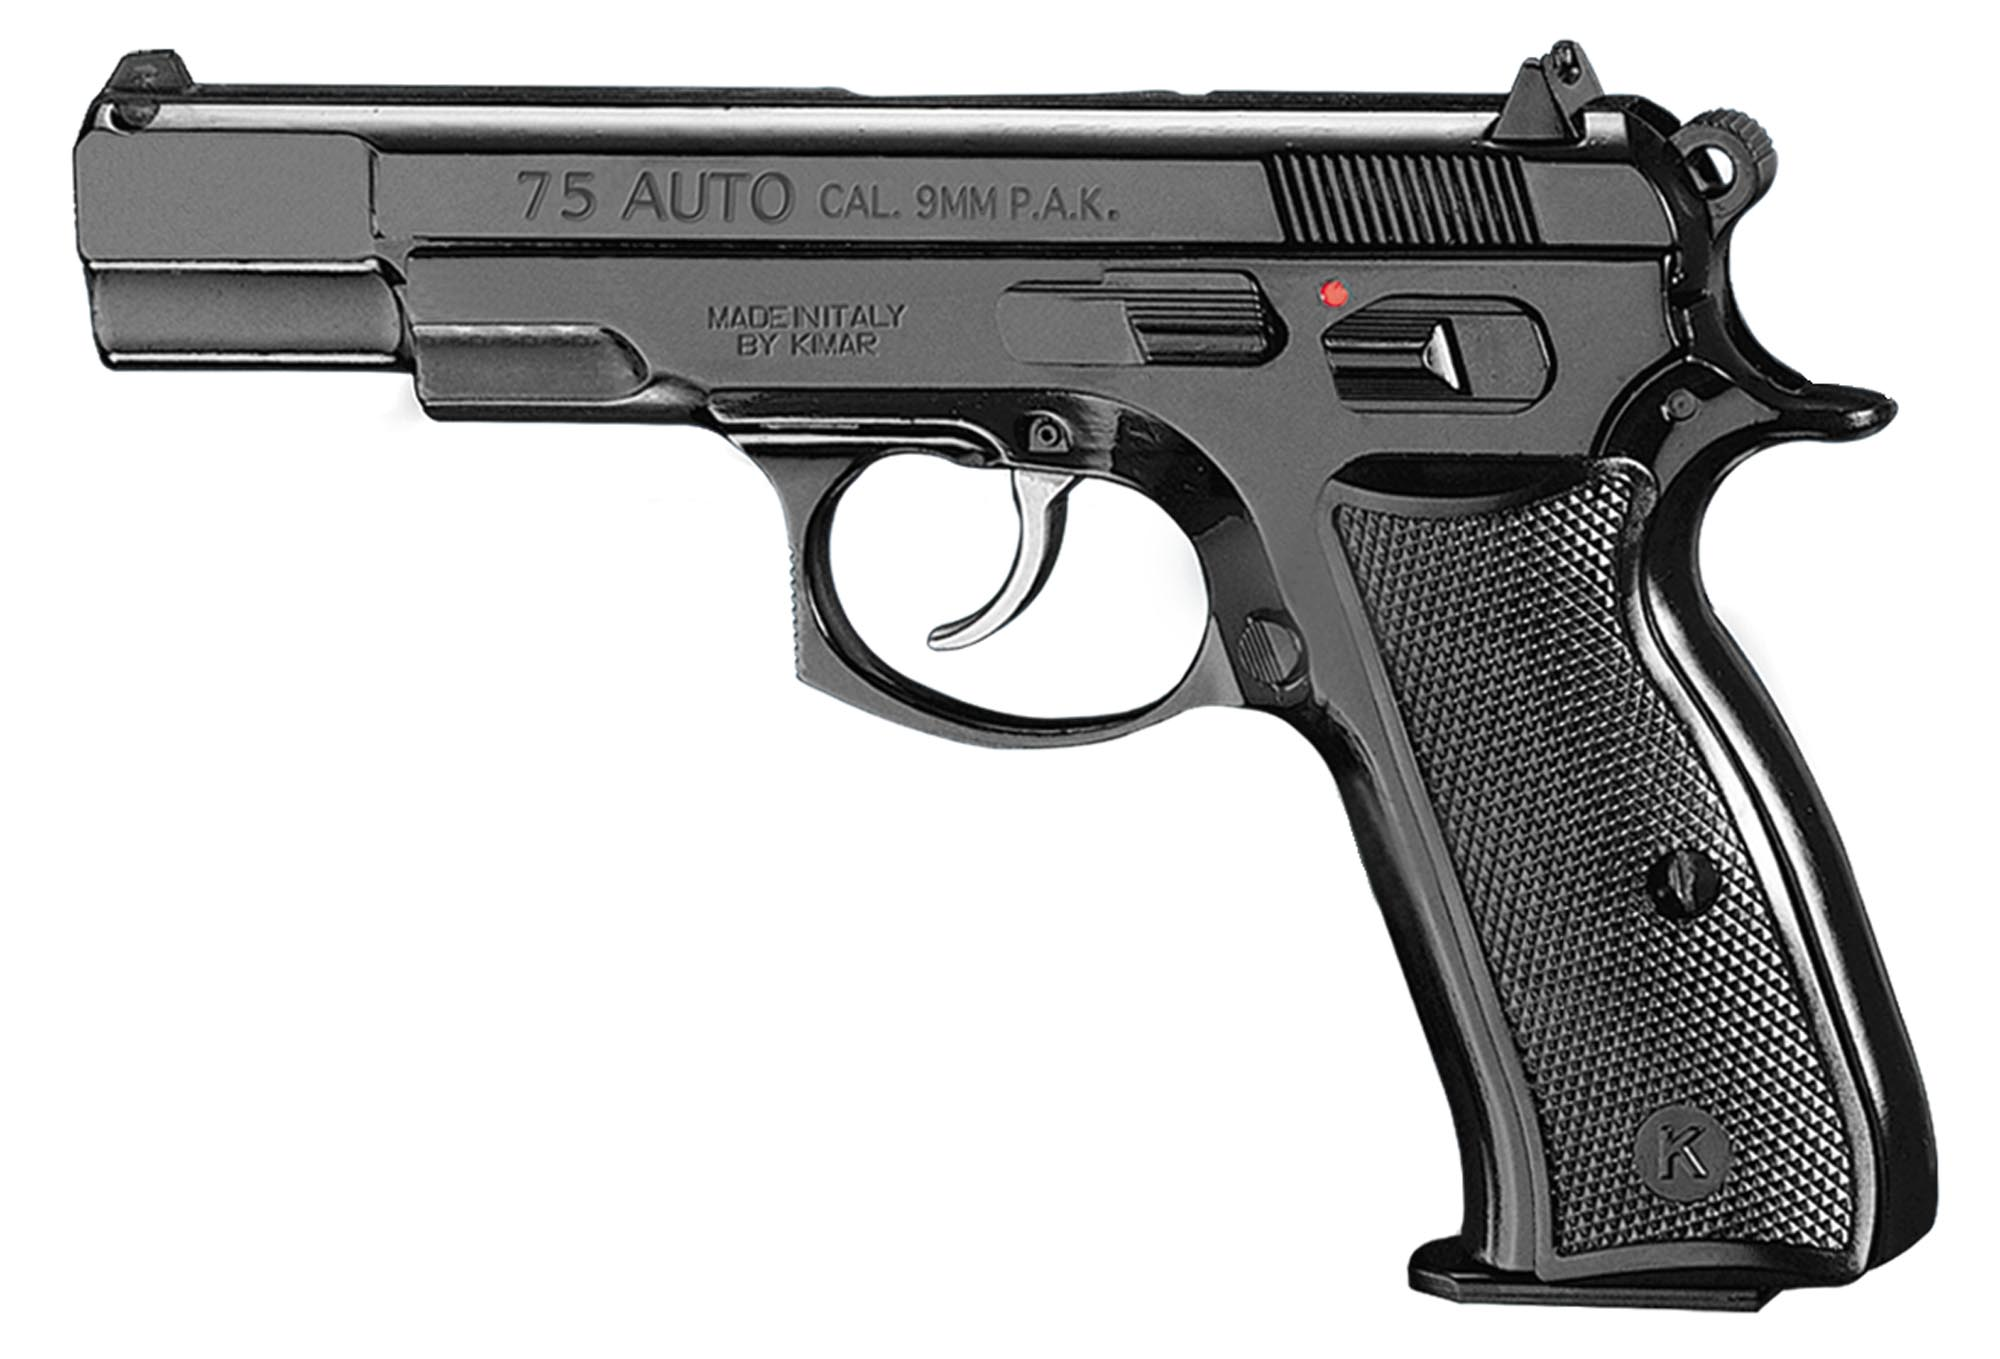 eaab235 chiappa pistolet 9 mm blanc cz75 w bronz. Black Bedroom Furniture Sets. Home Design Ideas